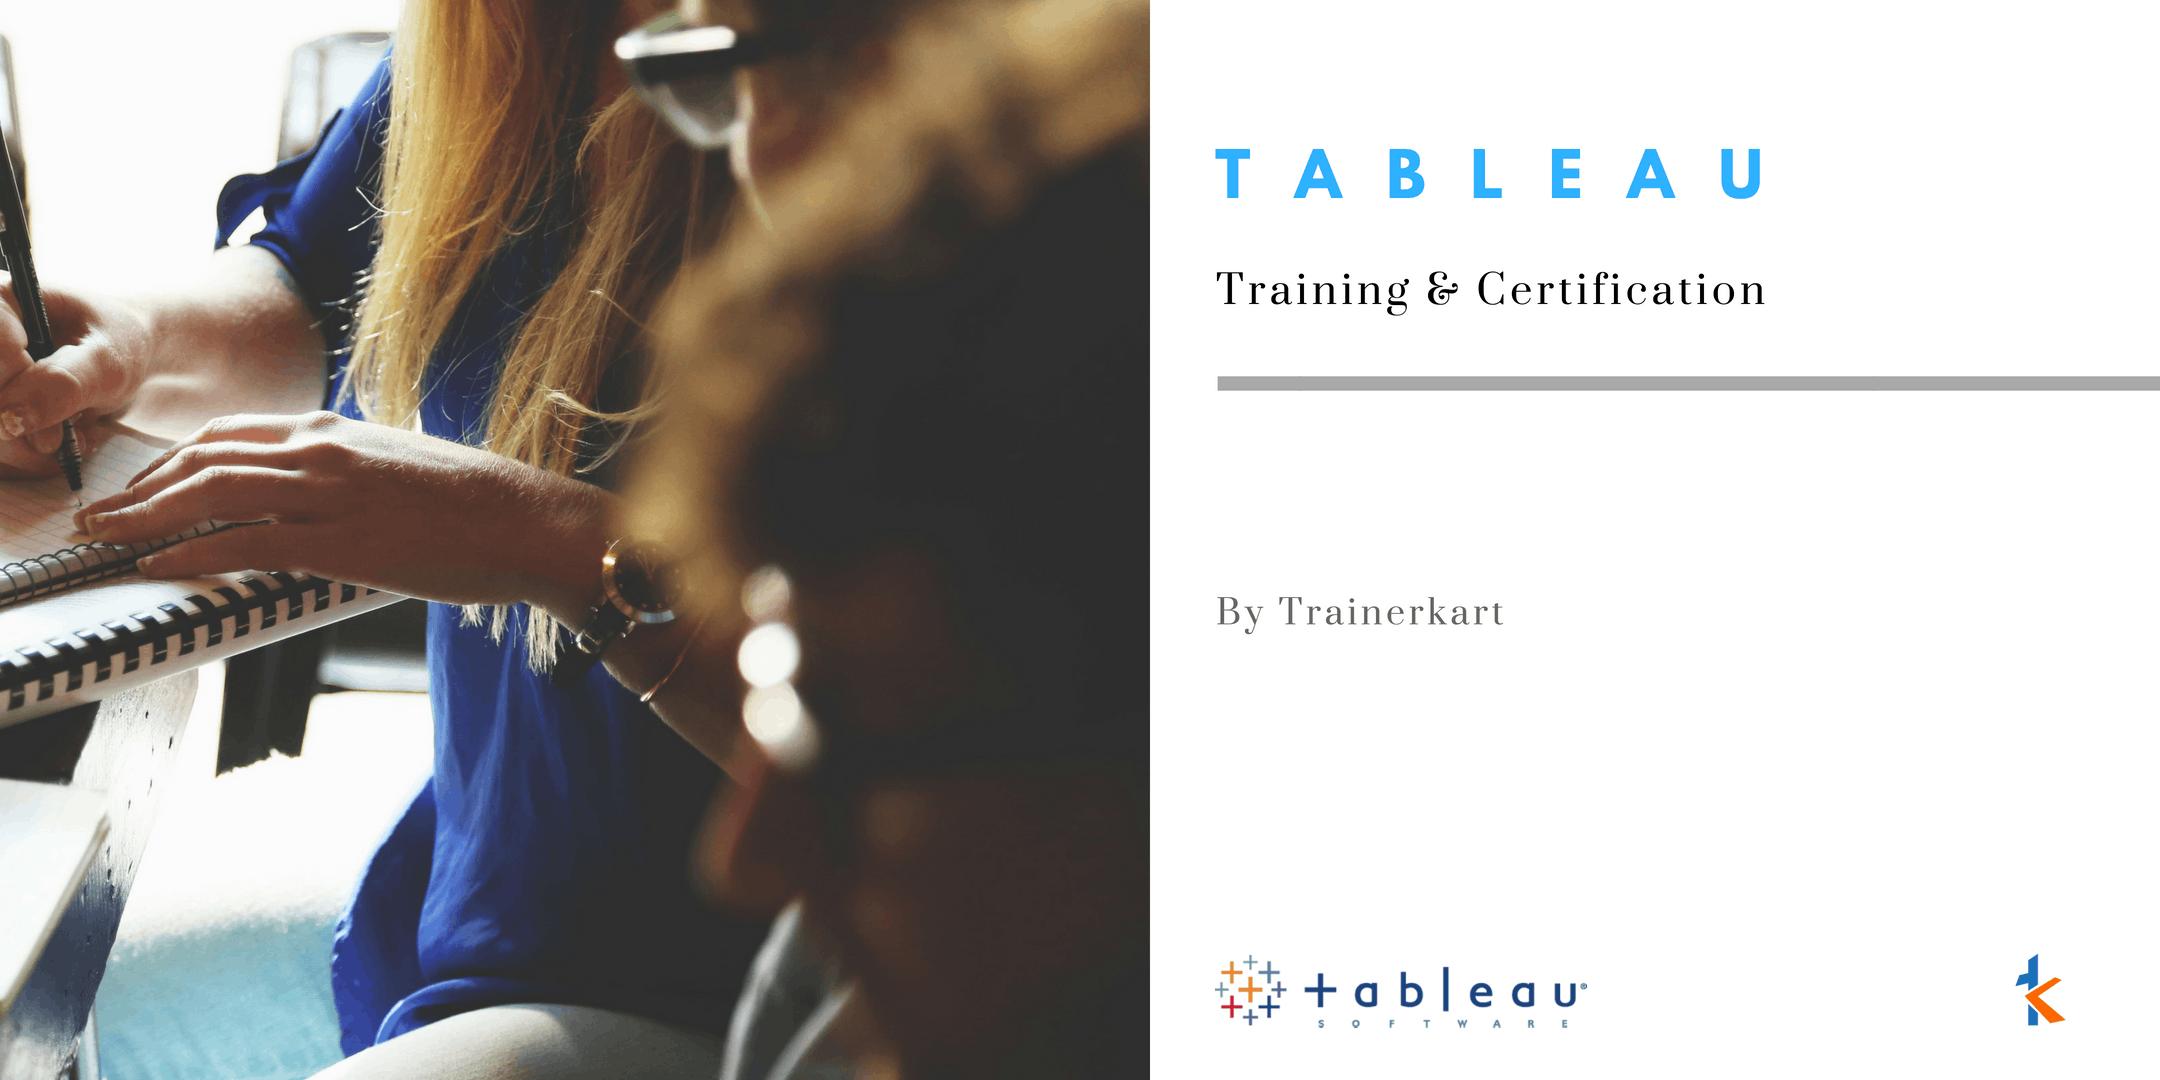 Tableau Training & Certification in Lansing,